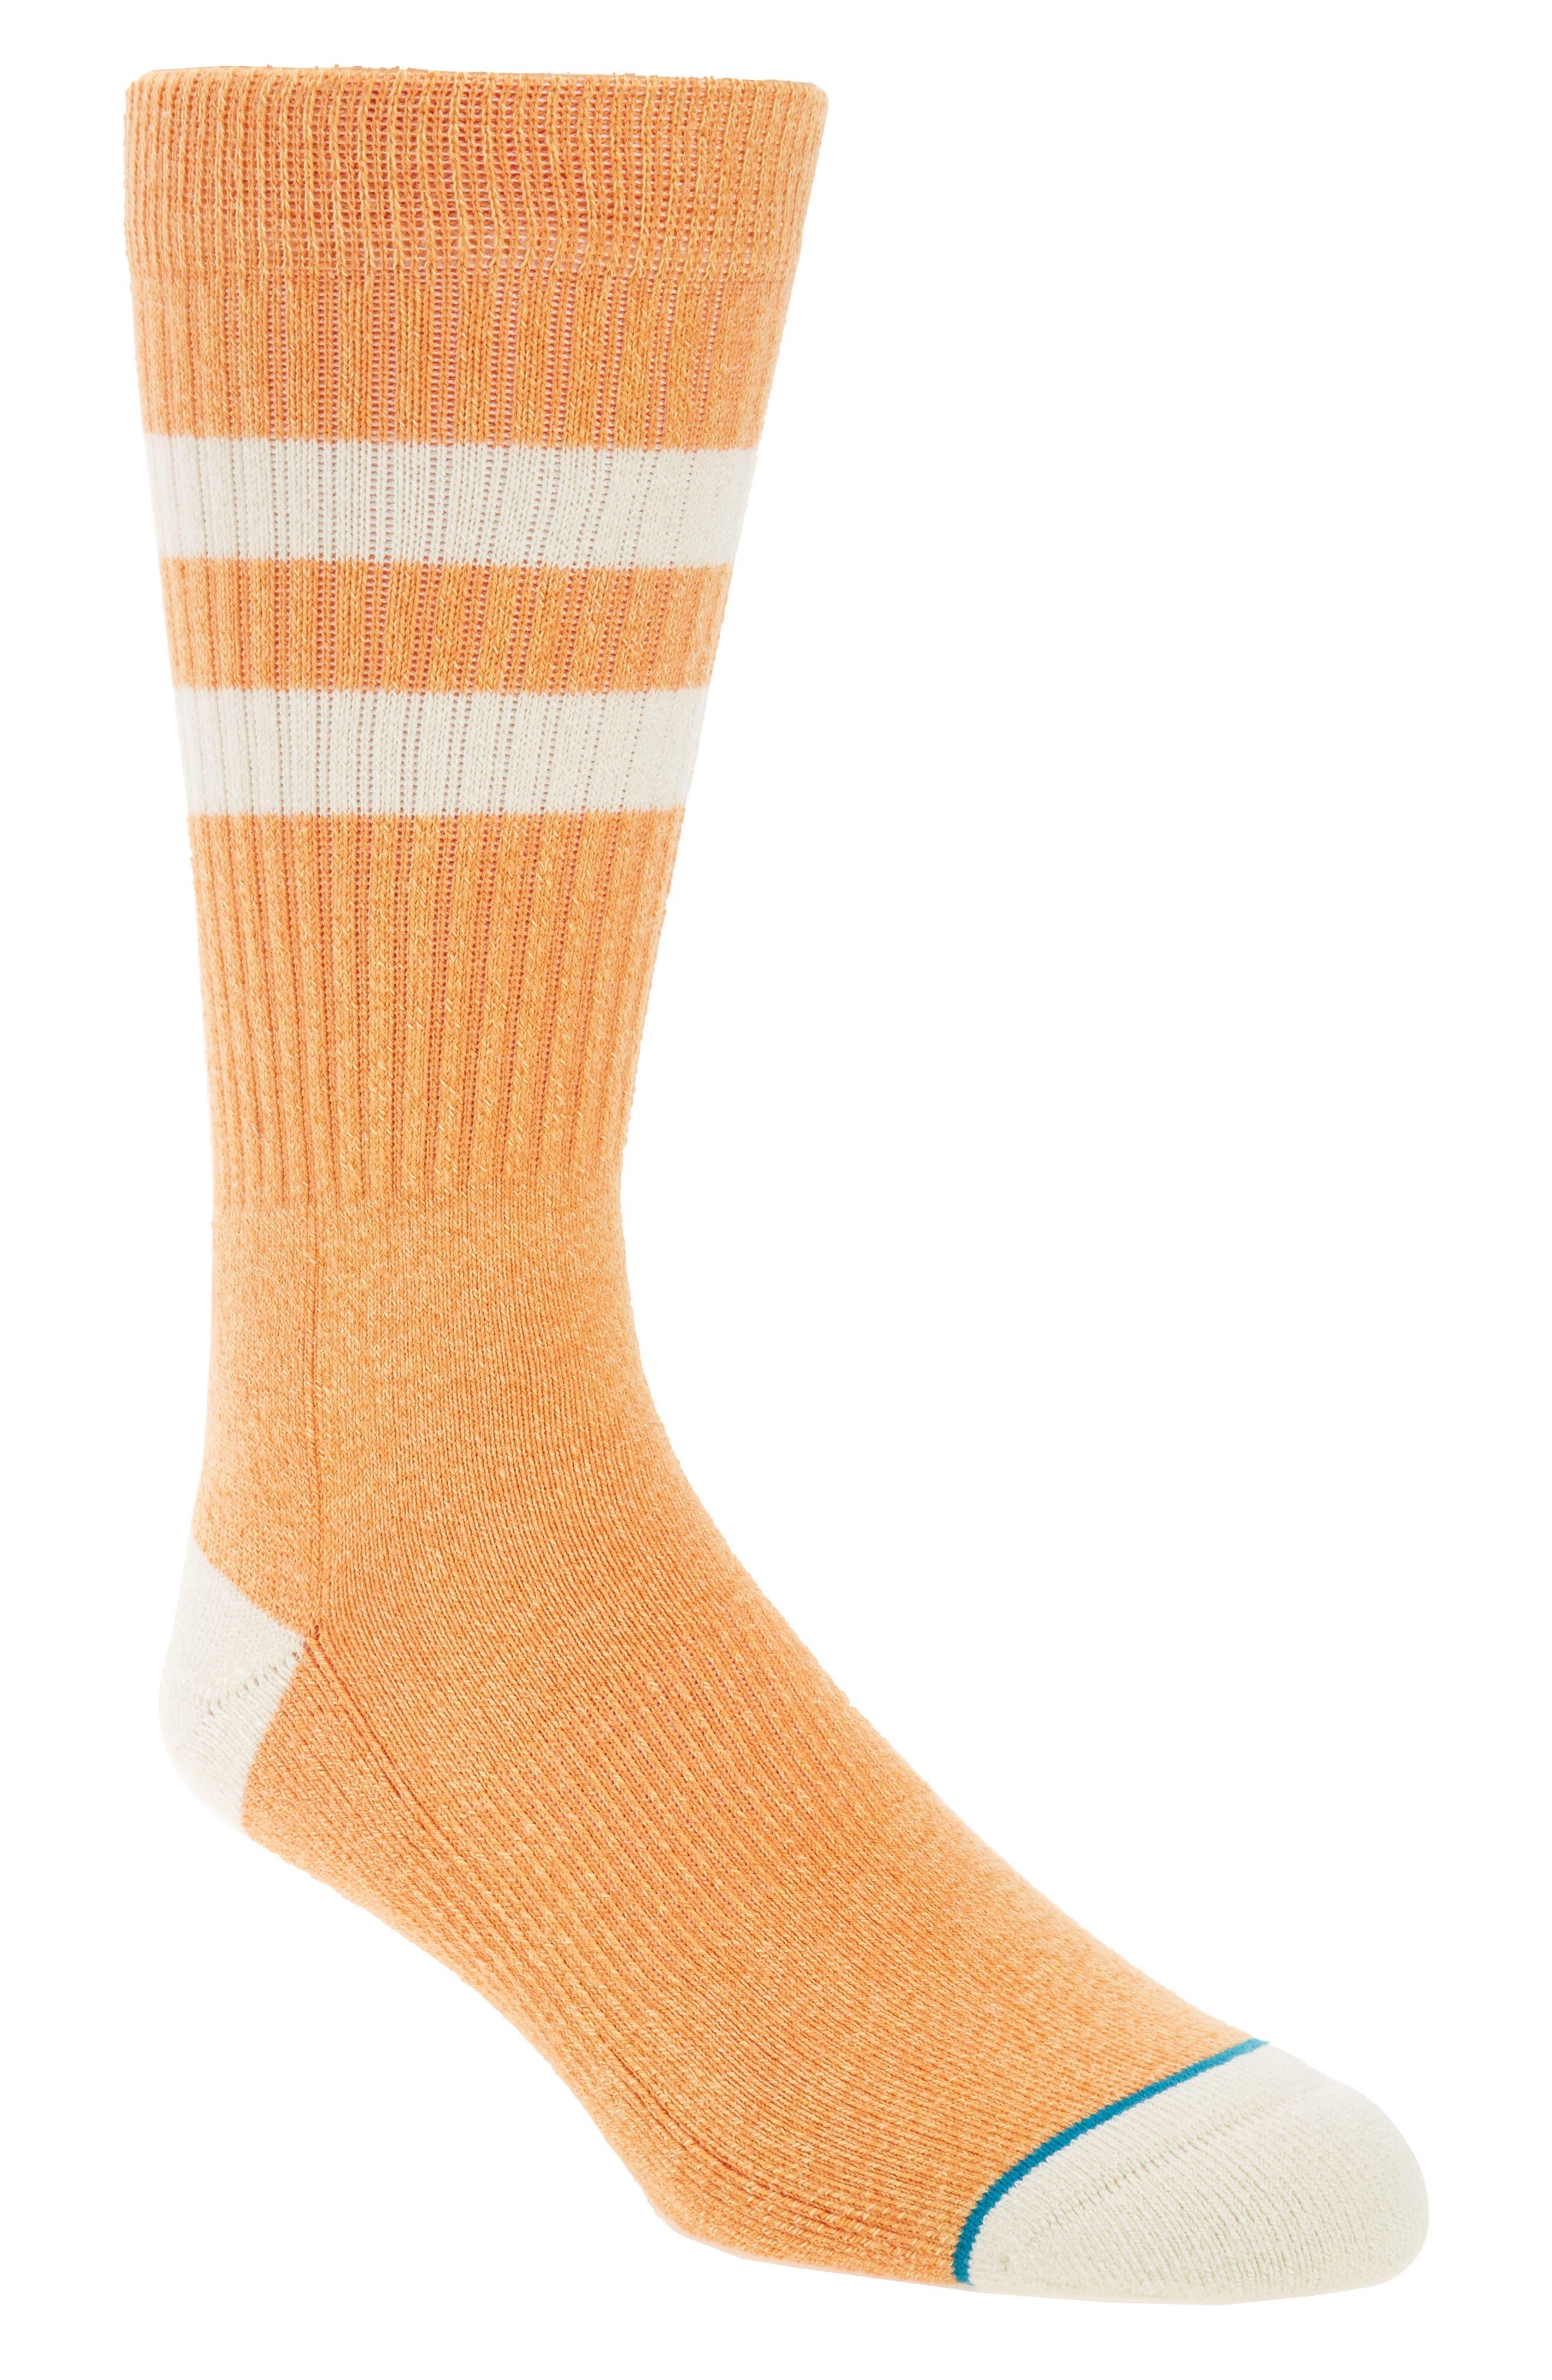 Salty Crew Socks,                         Main,                         color, Pastel Orange